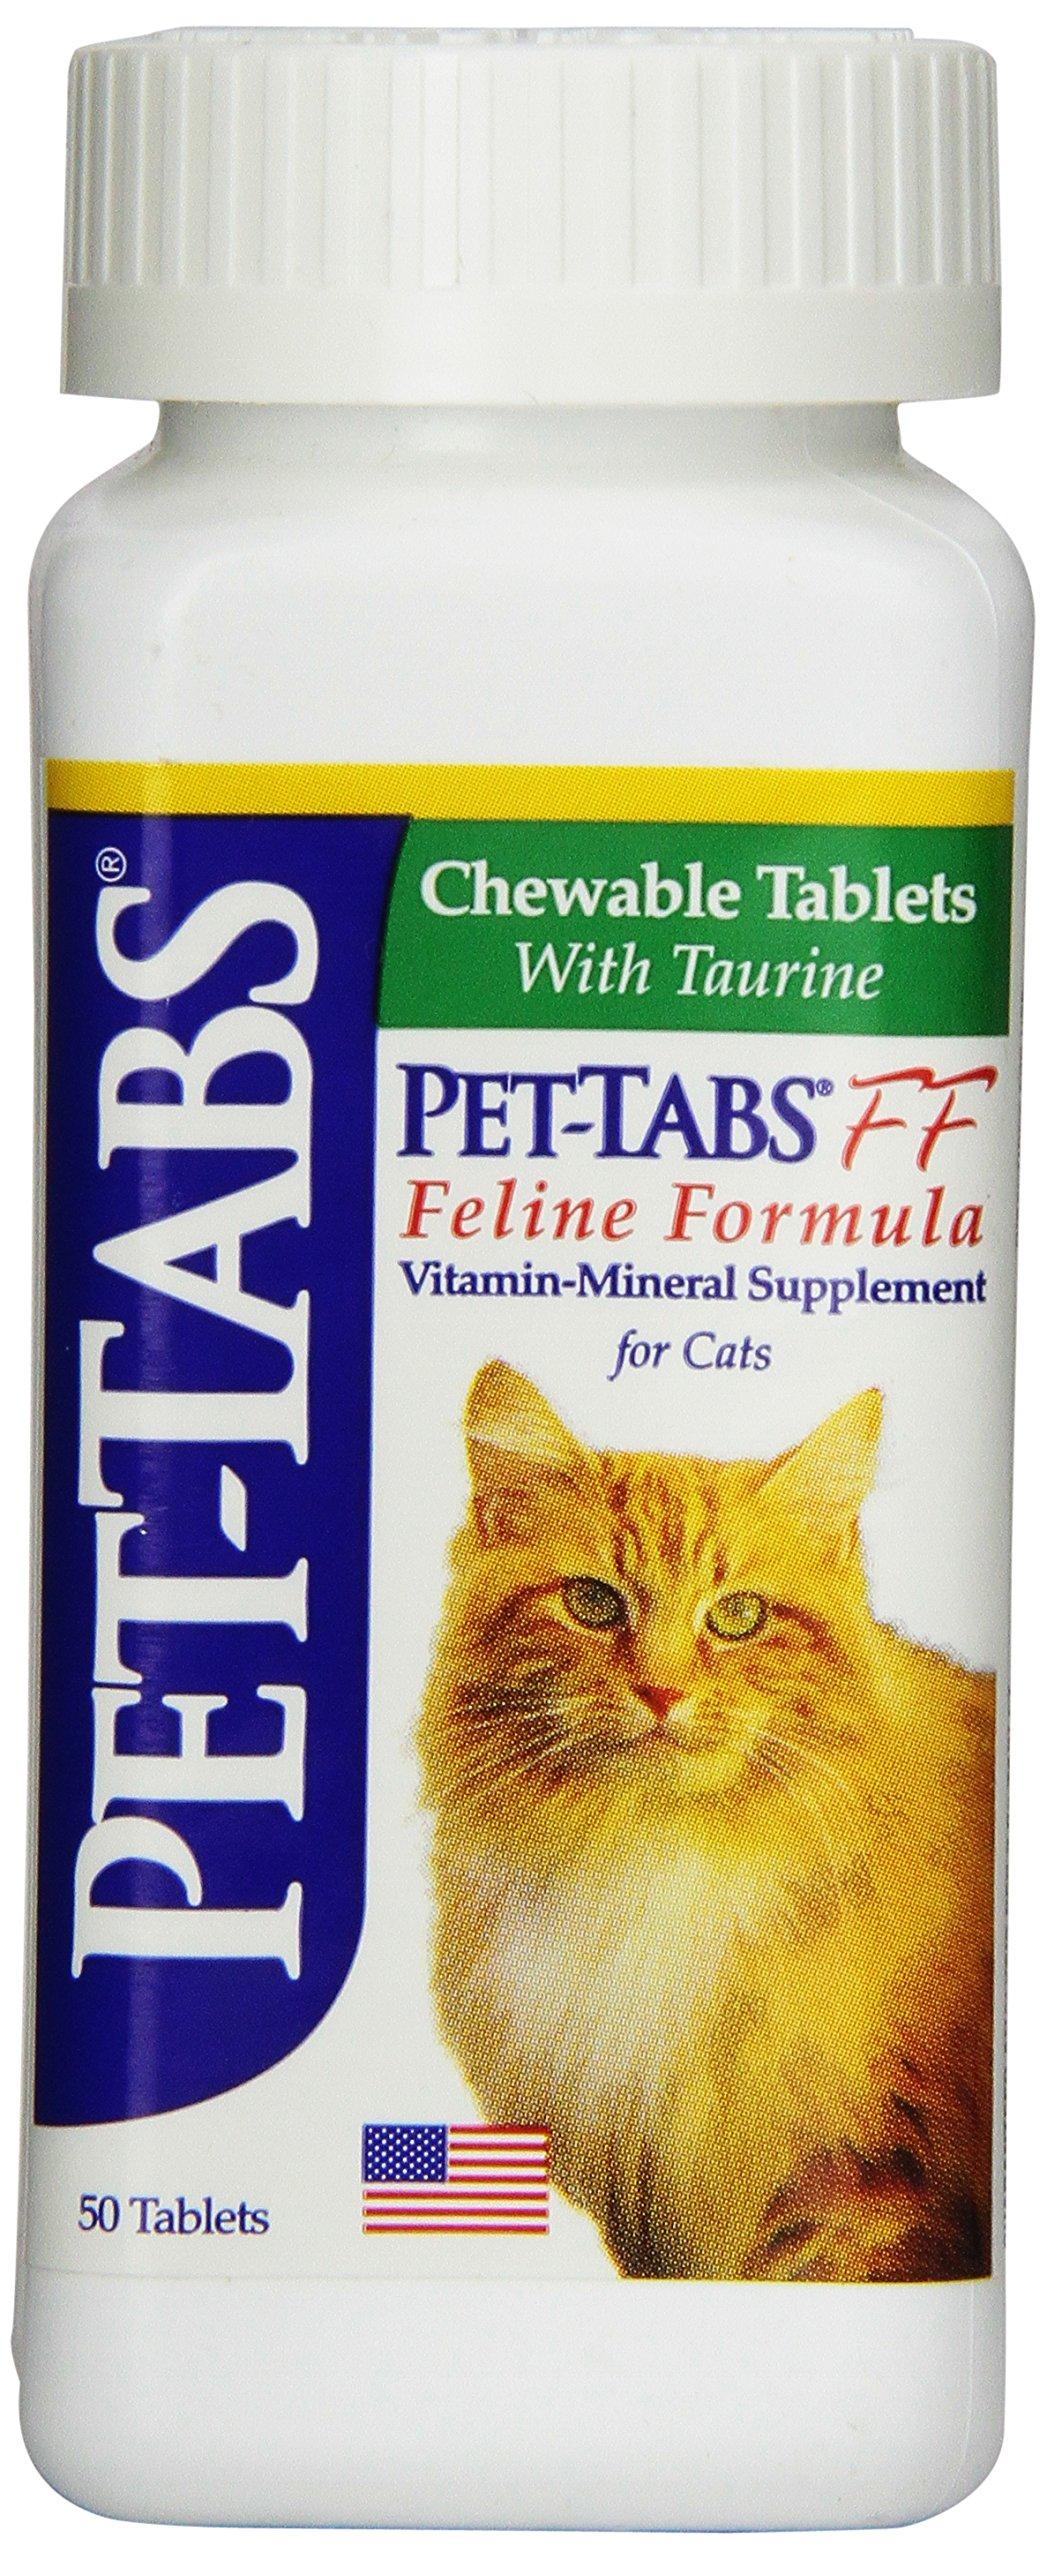 Pet-Tabs FF (Feline Formula), 50 ct. (Made in USA) by Virbac